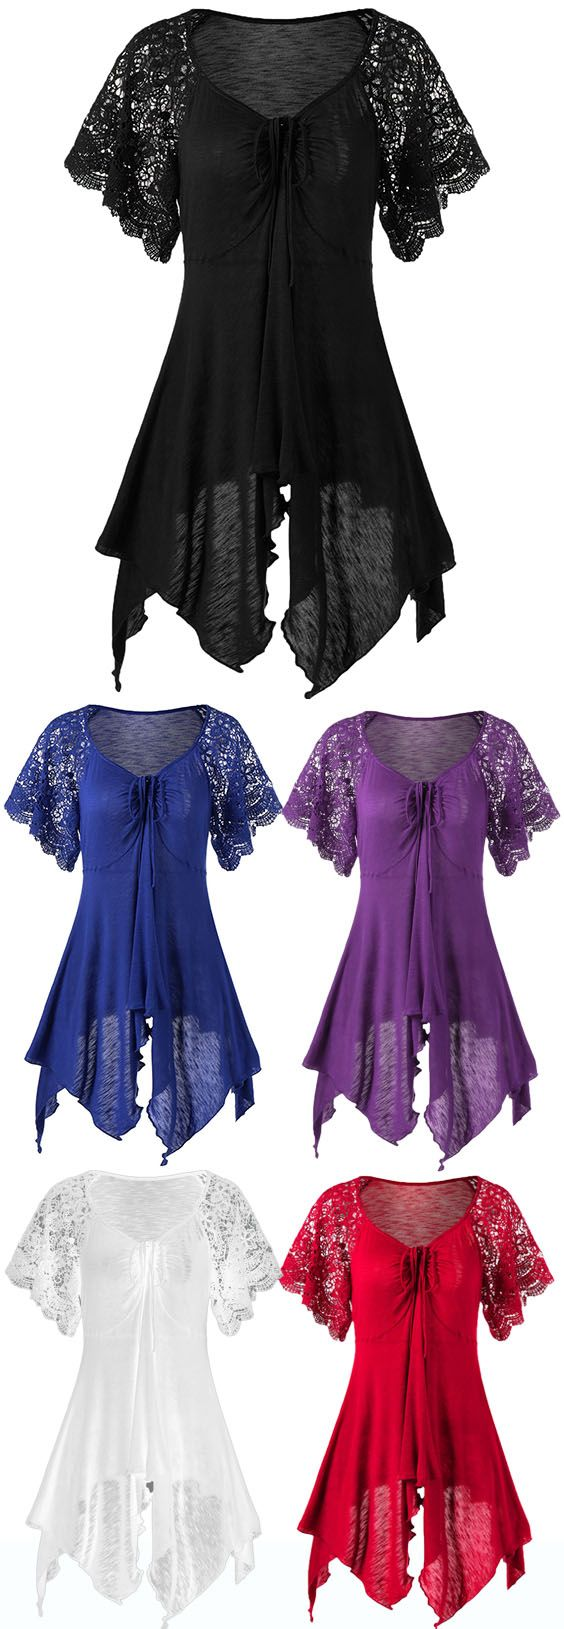 Plus Size Lace Sleeve Self Tie Handkerchief Top